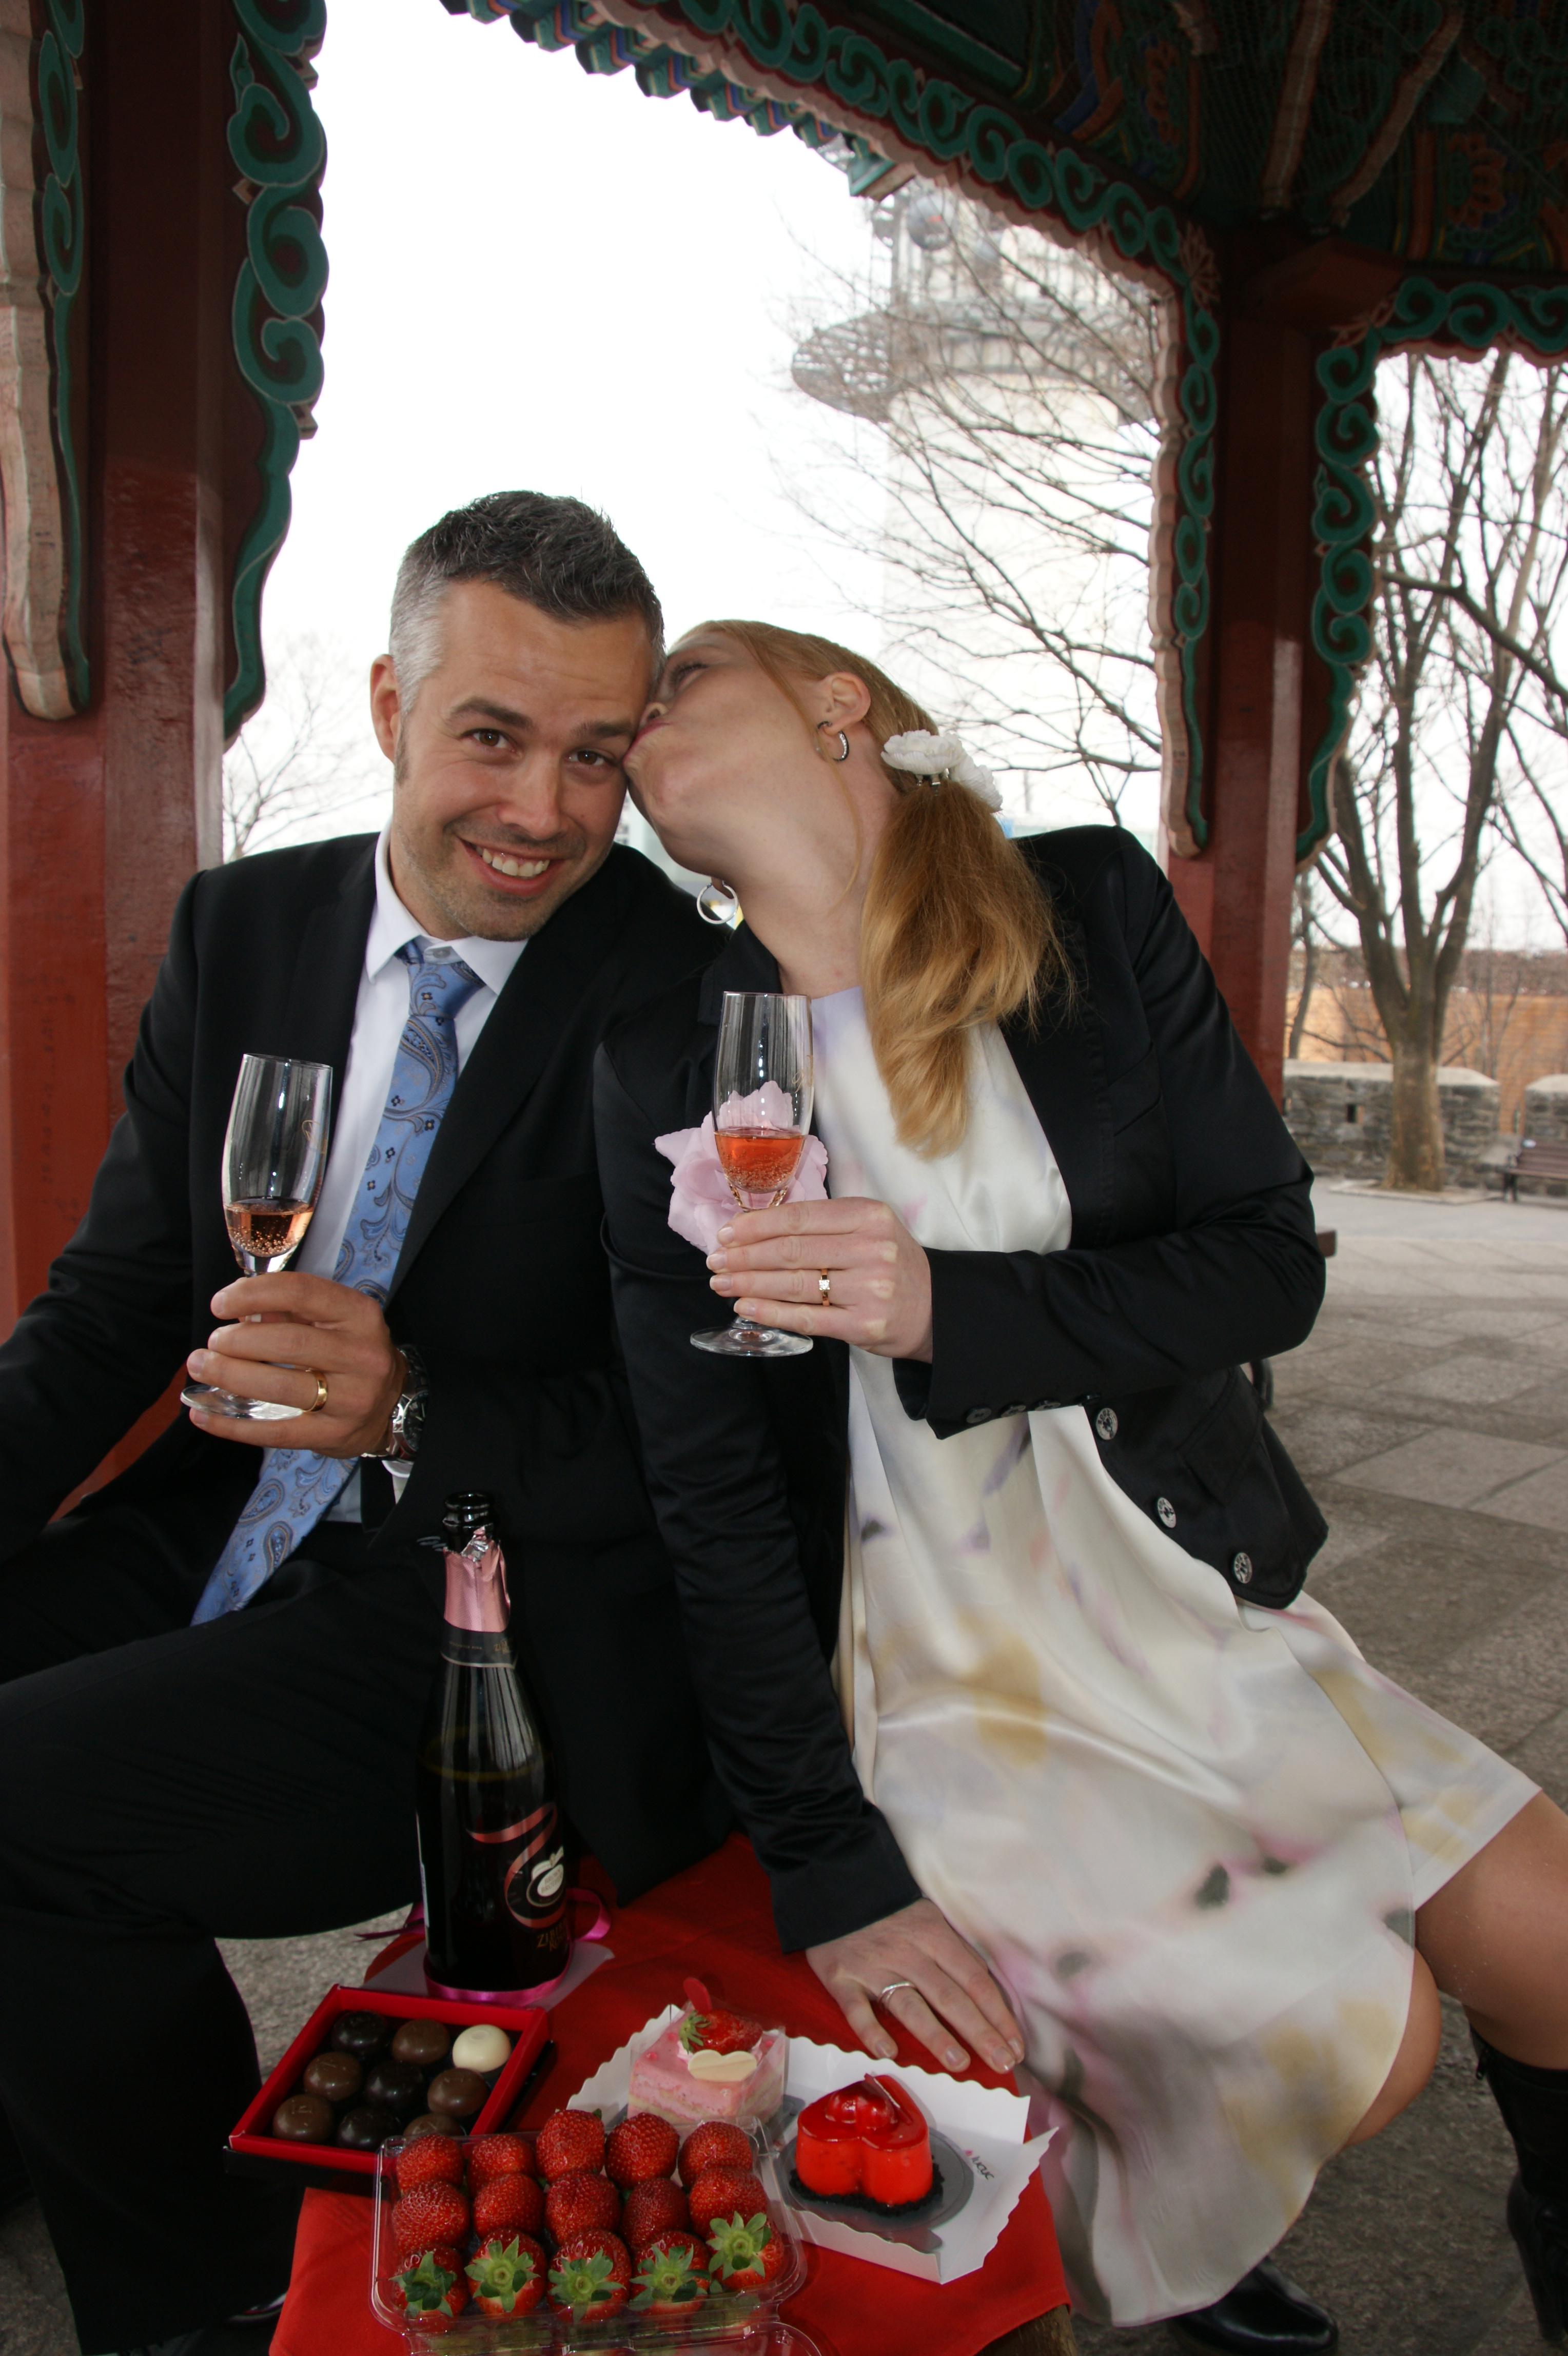 Redlands Speed Dating